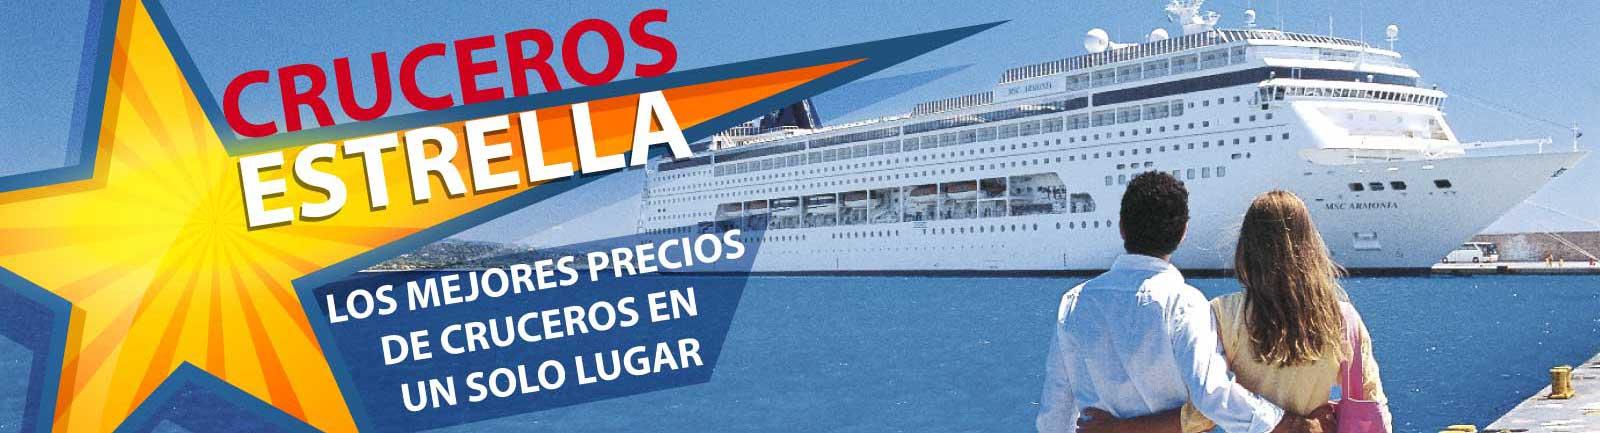 Destino Cruceros ESTRELLA